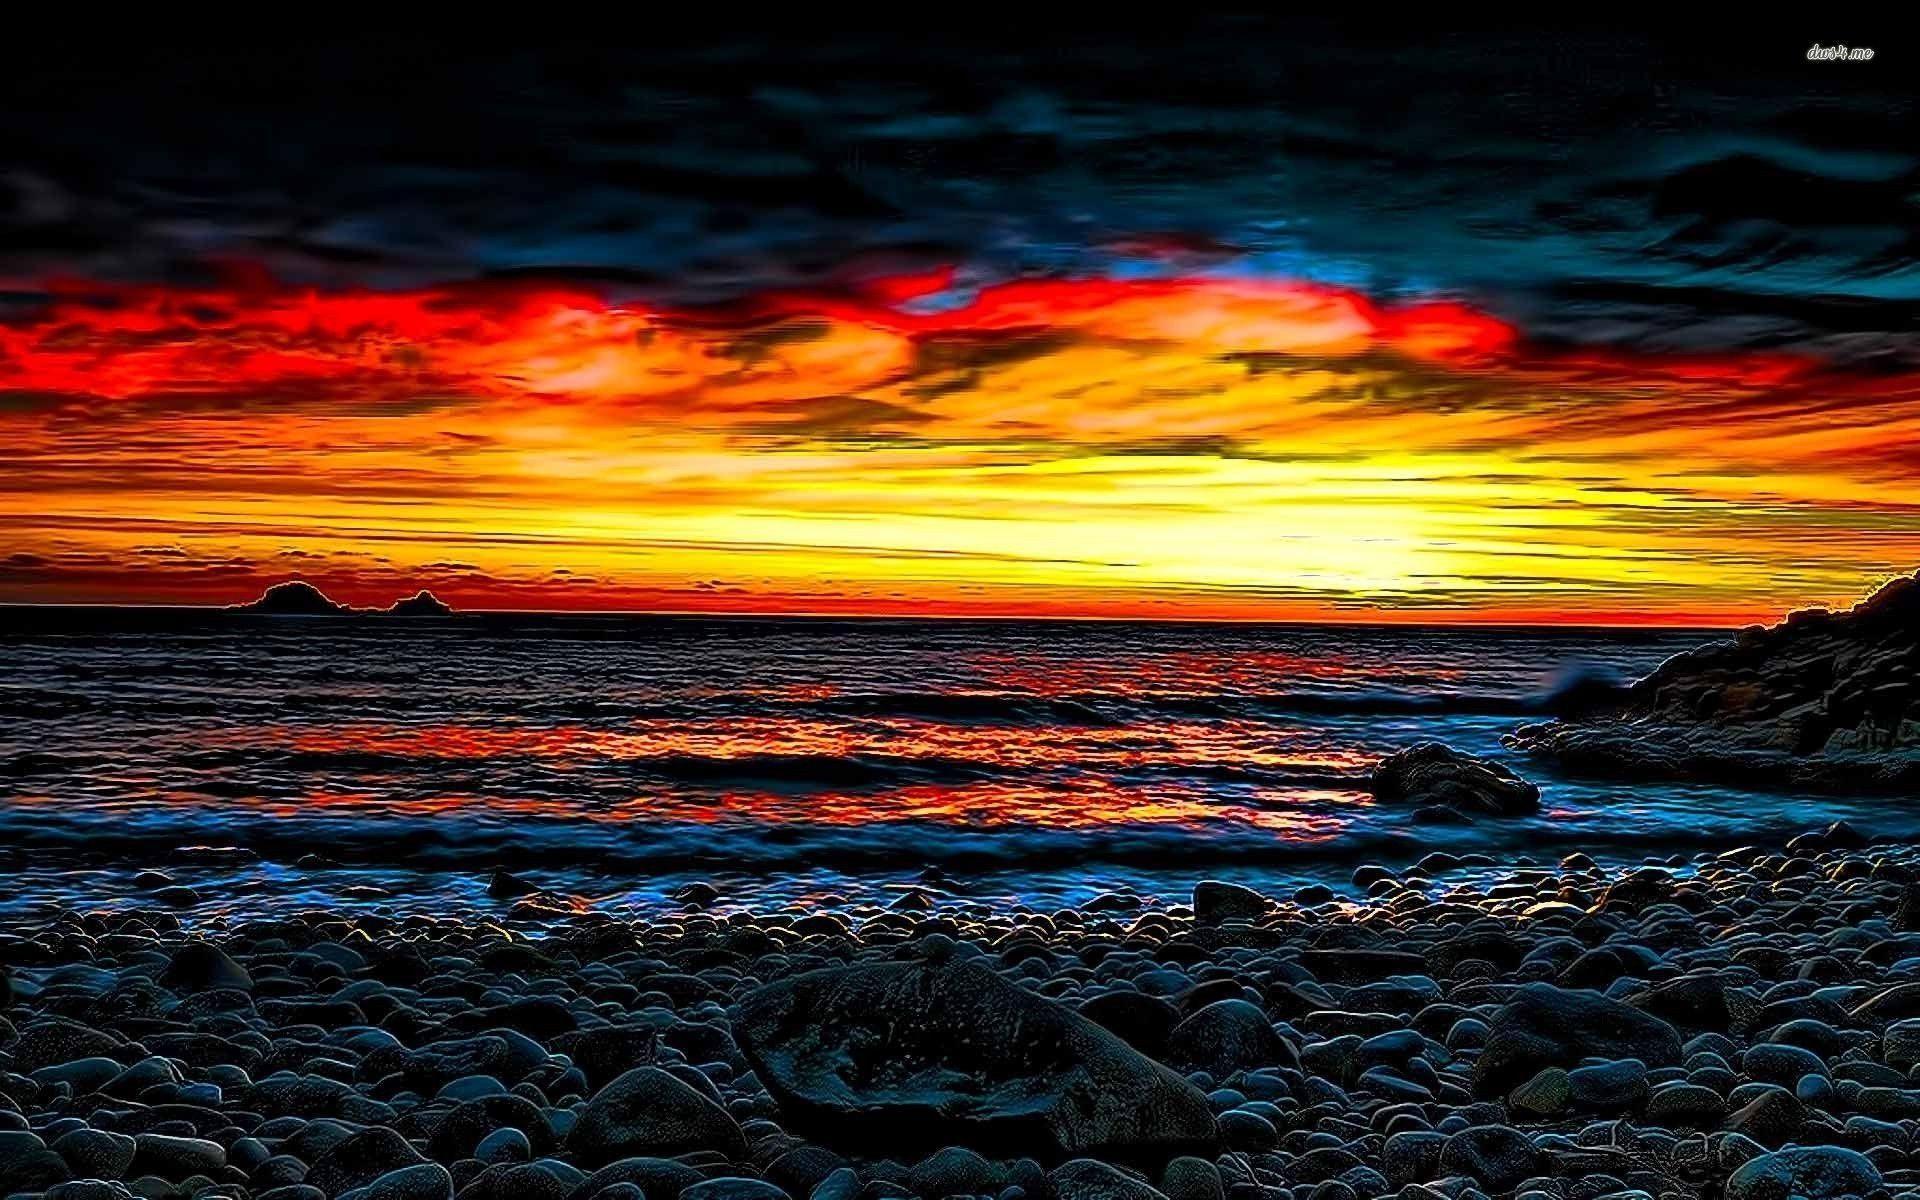 Beach Sunrise Wallpaper  WallpaperSafari